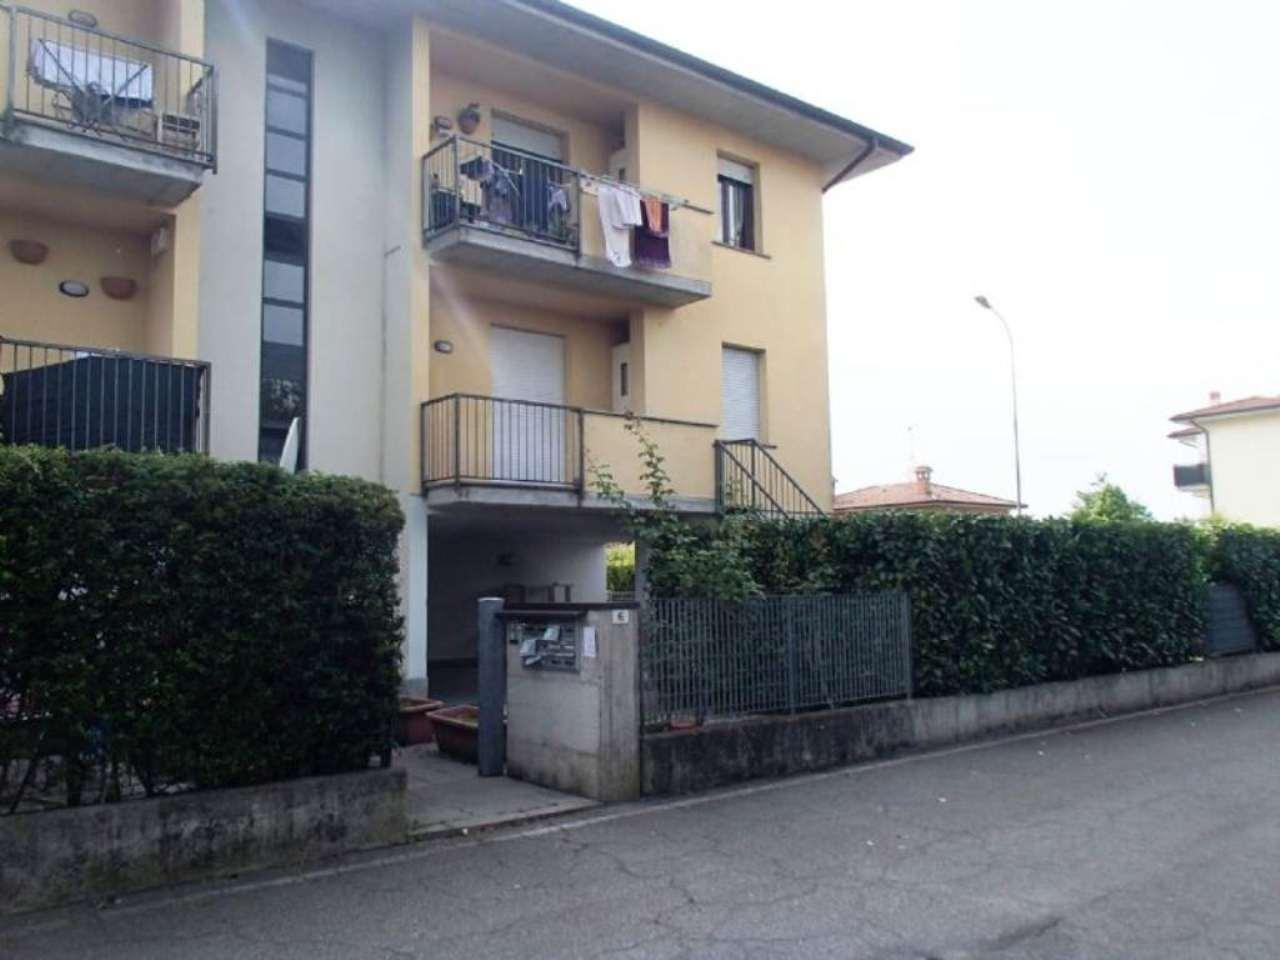 Bilocale Torrevecchia Pia Via Leonardo Da Vinci 10